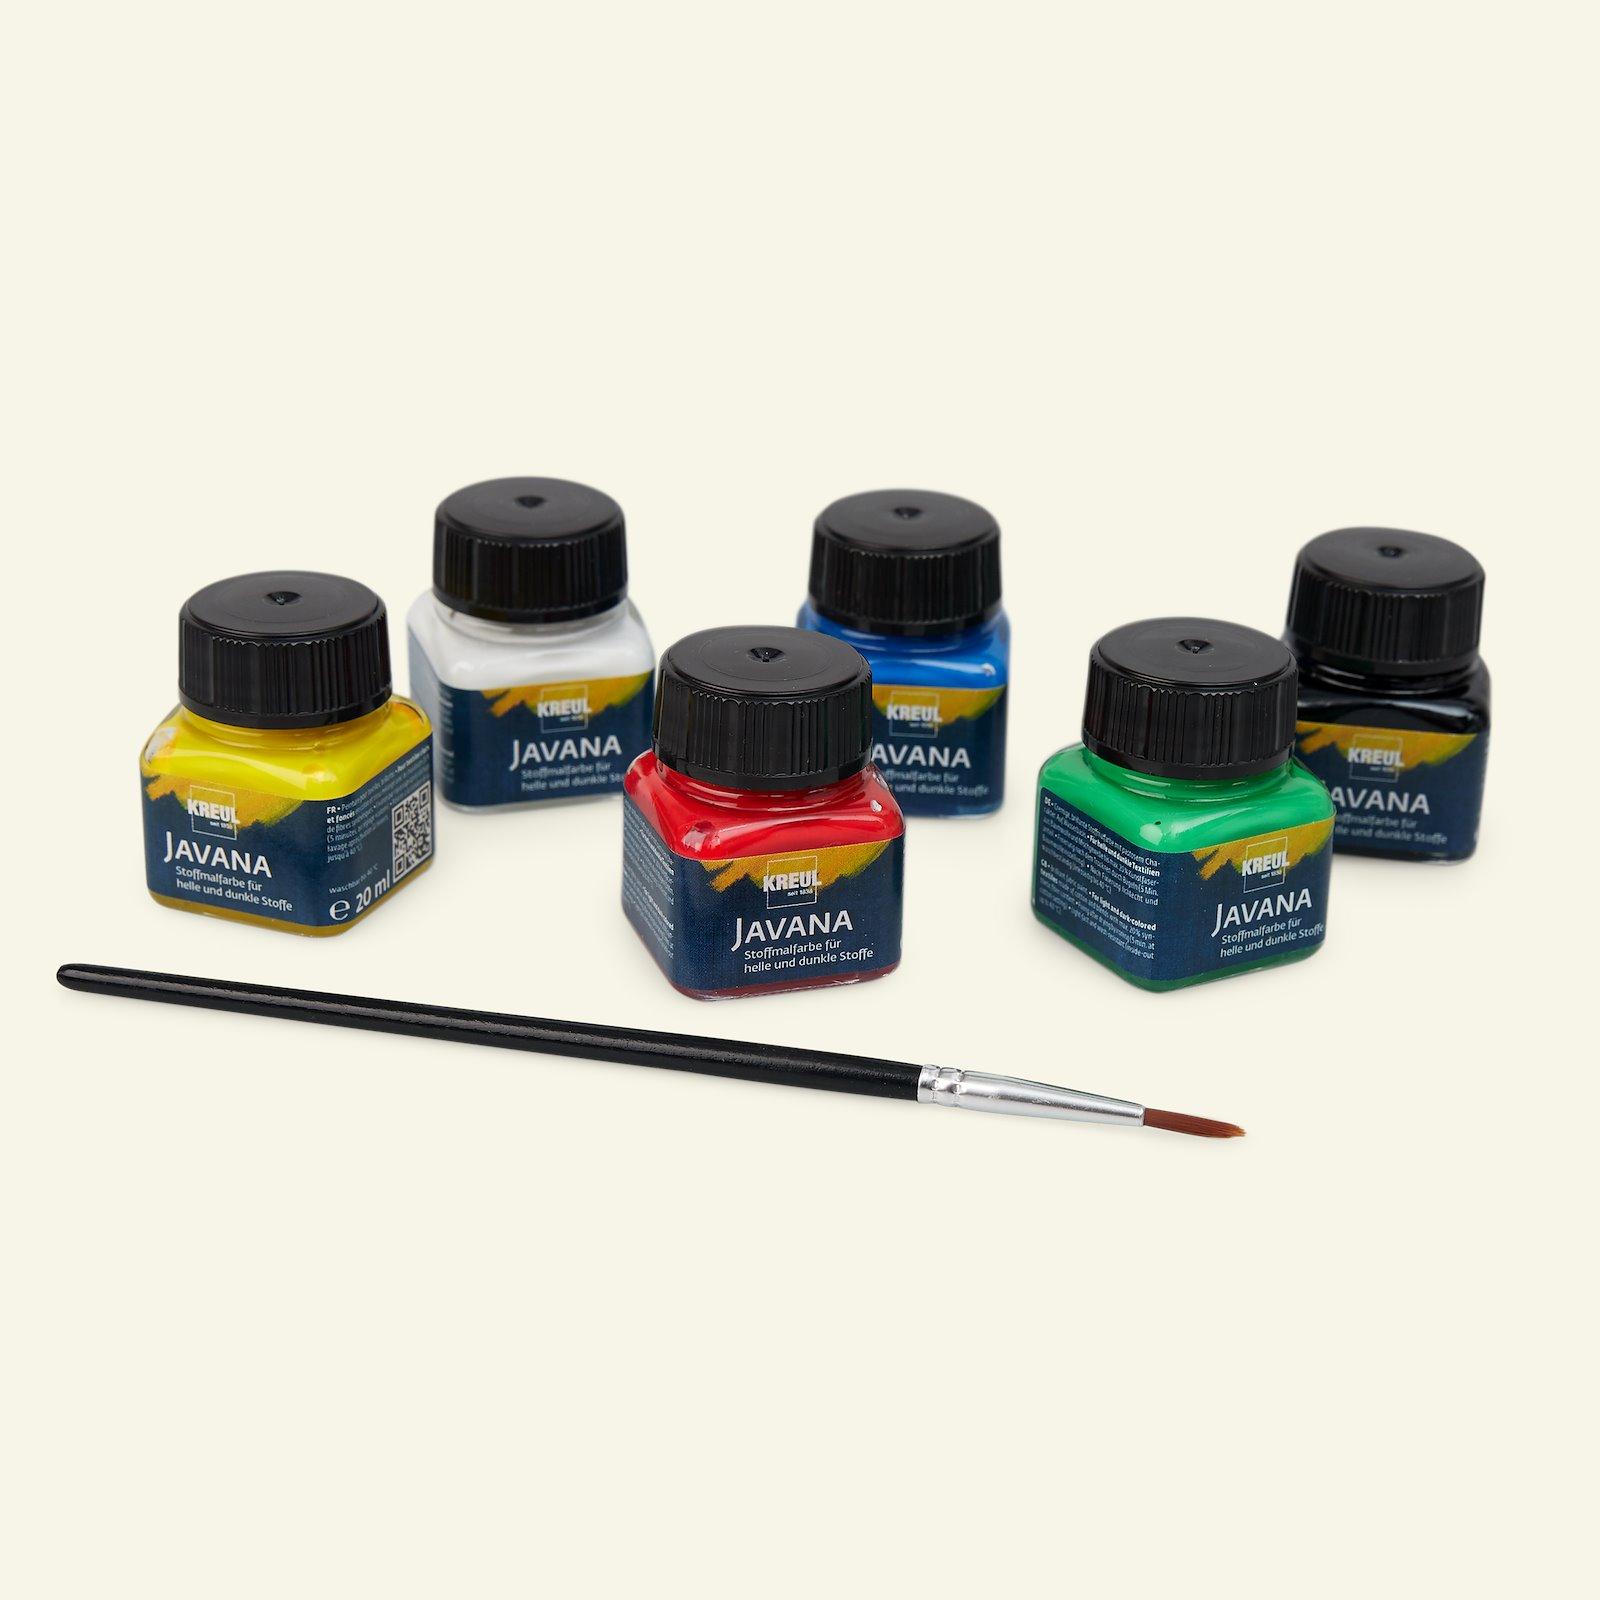 Javana opq fabric paints basic 6x20ml 29554_pack_b